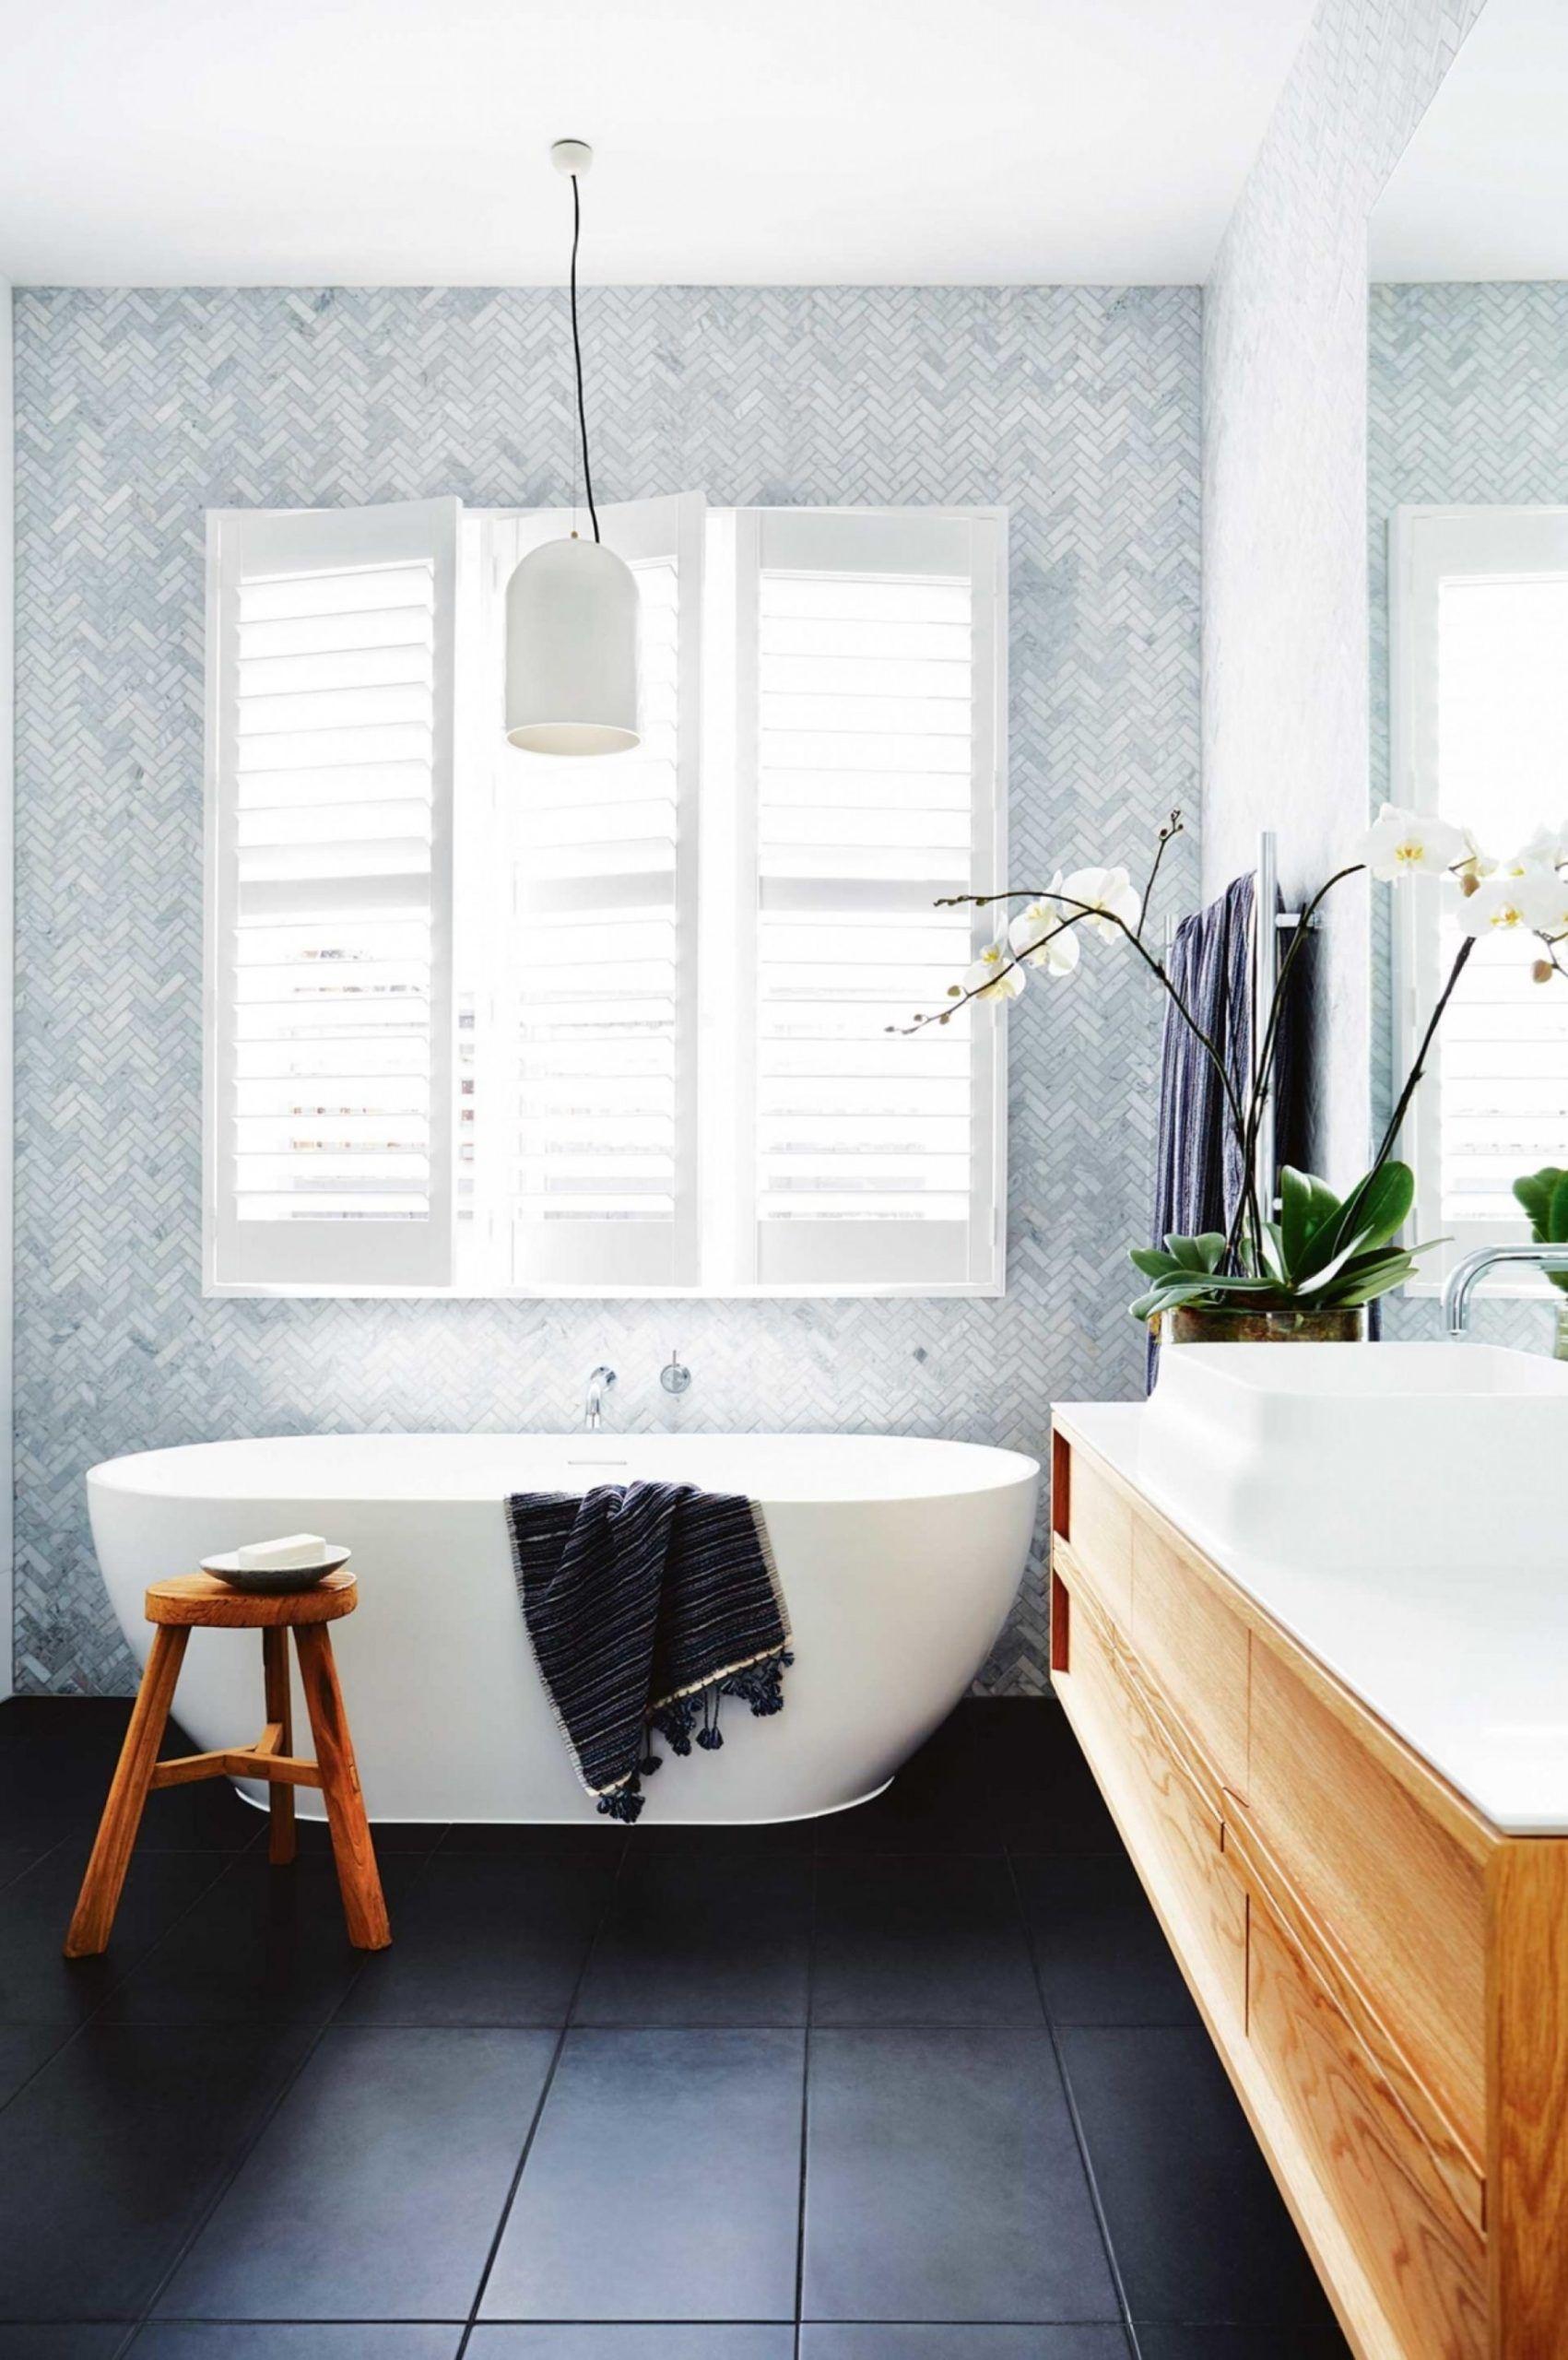 Why Is Bathroom Ideas Dark Floor Light Walls So Famous In 2020 Bathroom Tile Designs Bathroom Interior Home